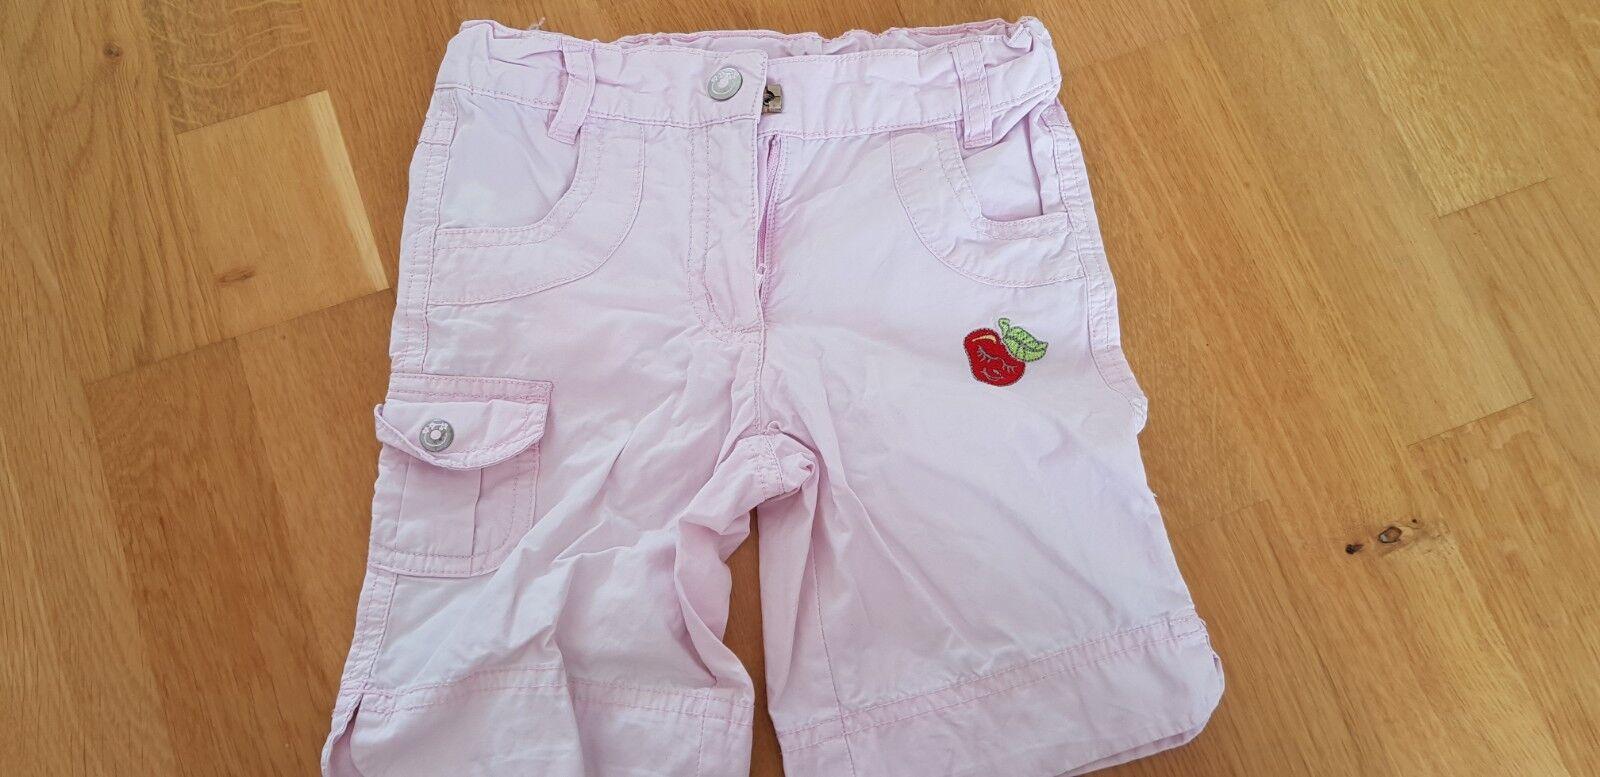 Kurze Hosen - Shorts - Bermuda Impidimpi 86/92 Jeans rosa baby kleinkind